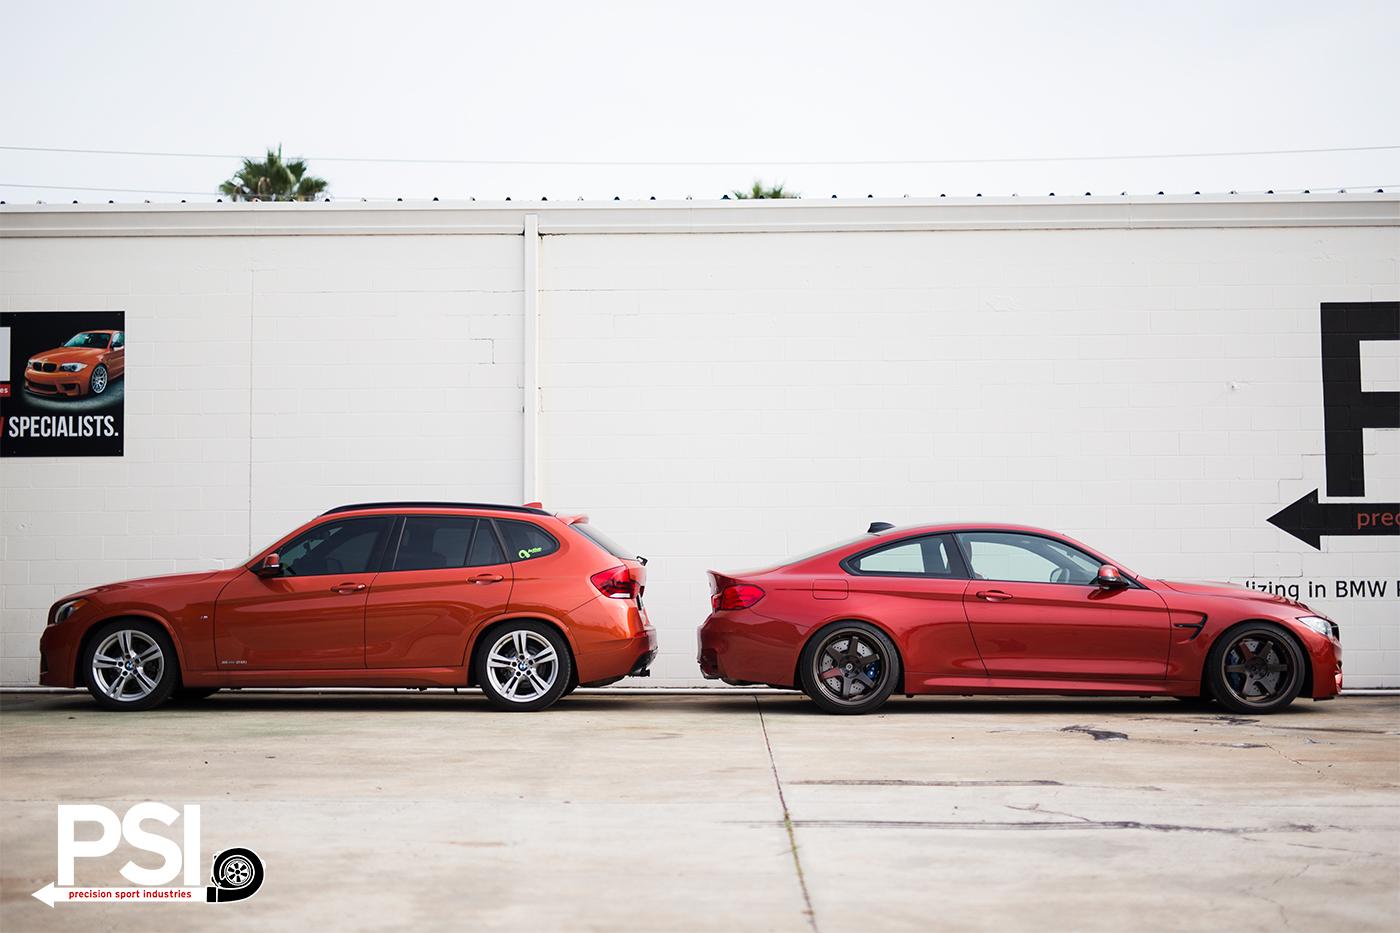 Psi S Sakhir Orange Bmw M4 Makes Some Friends Autoevolution